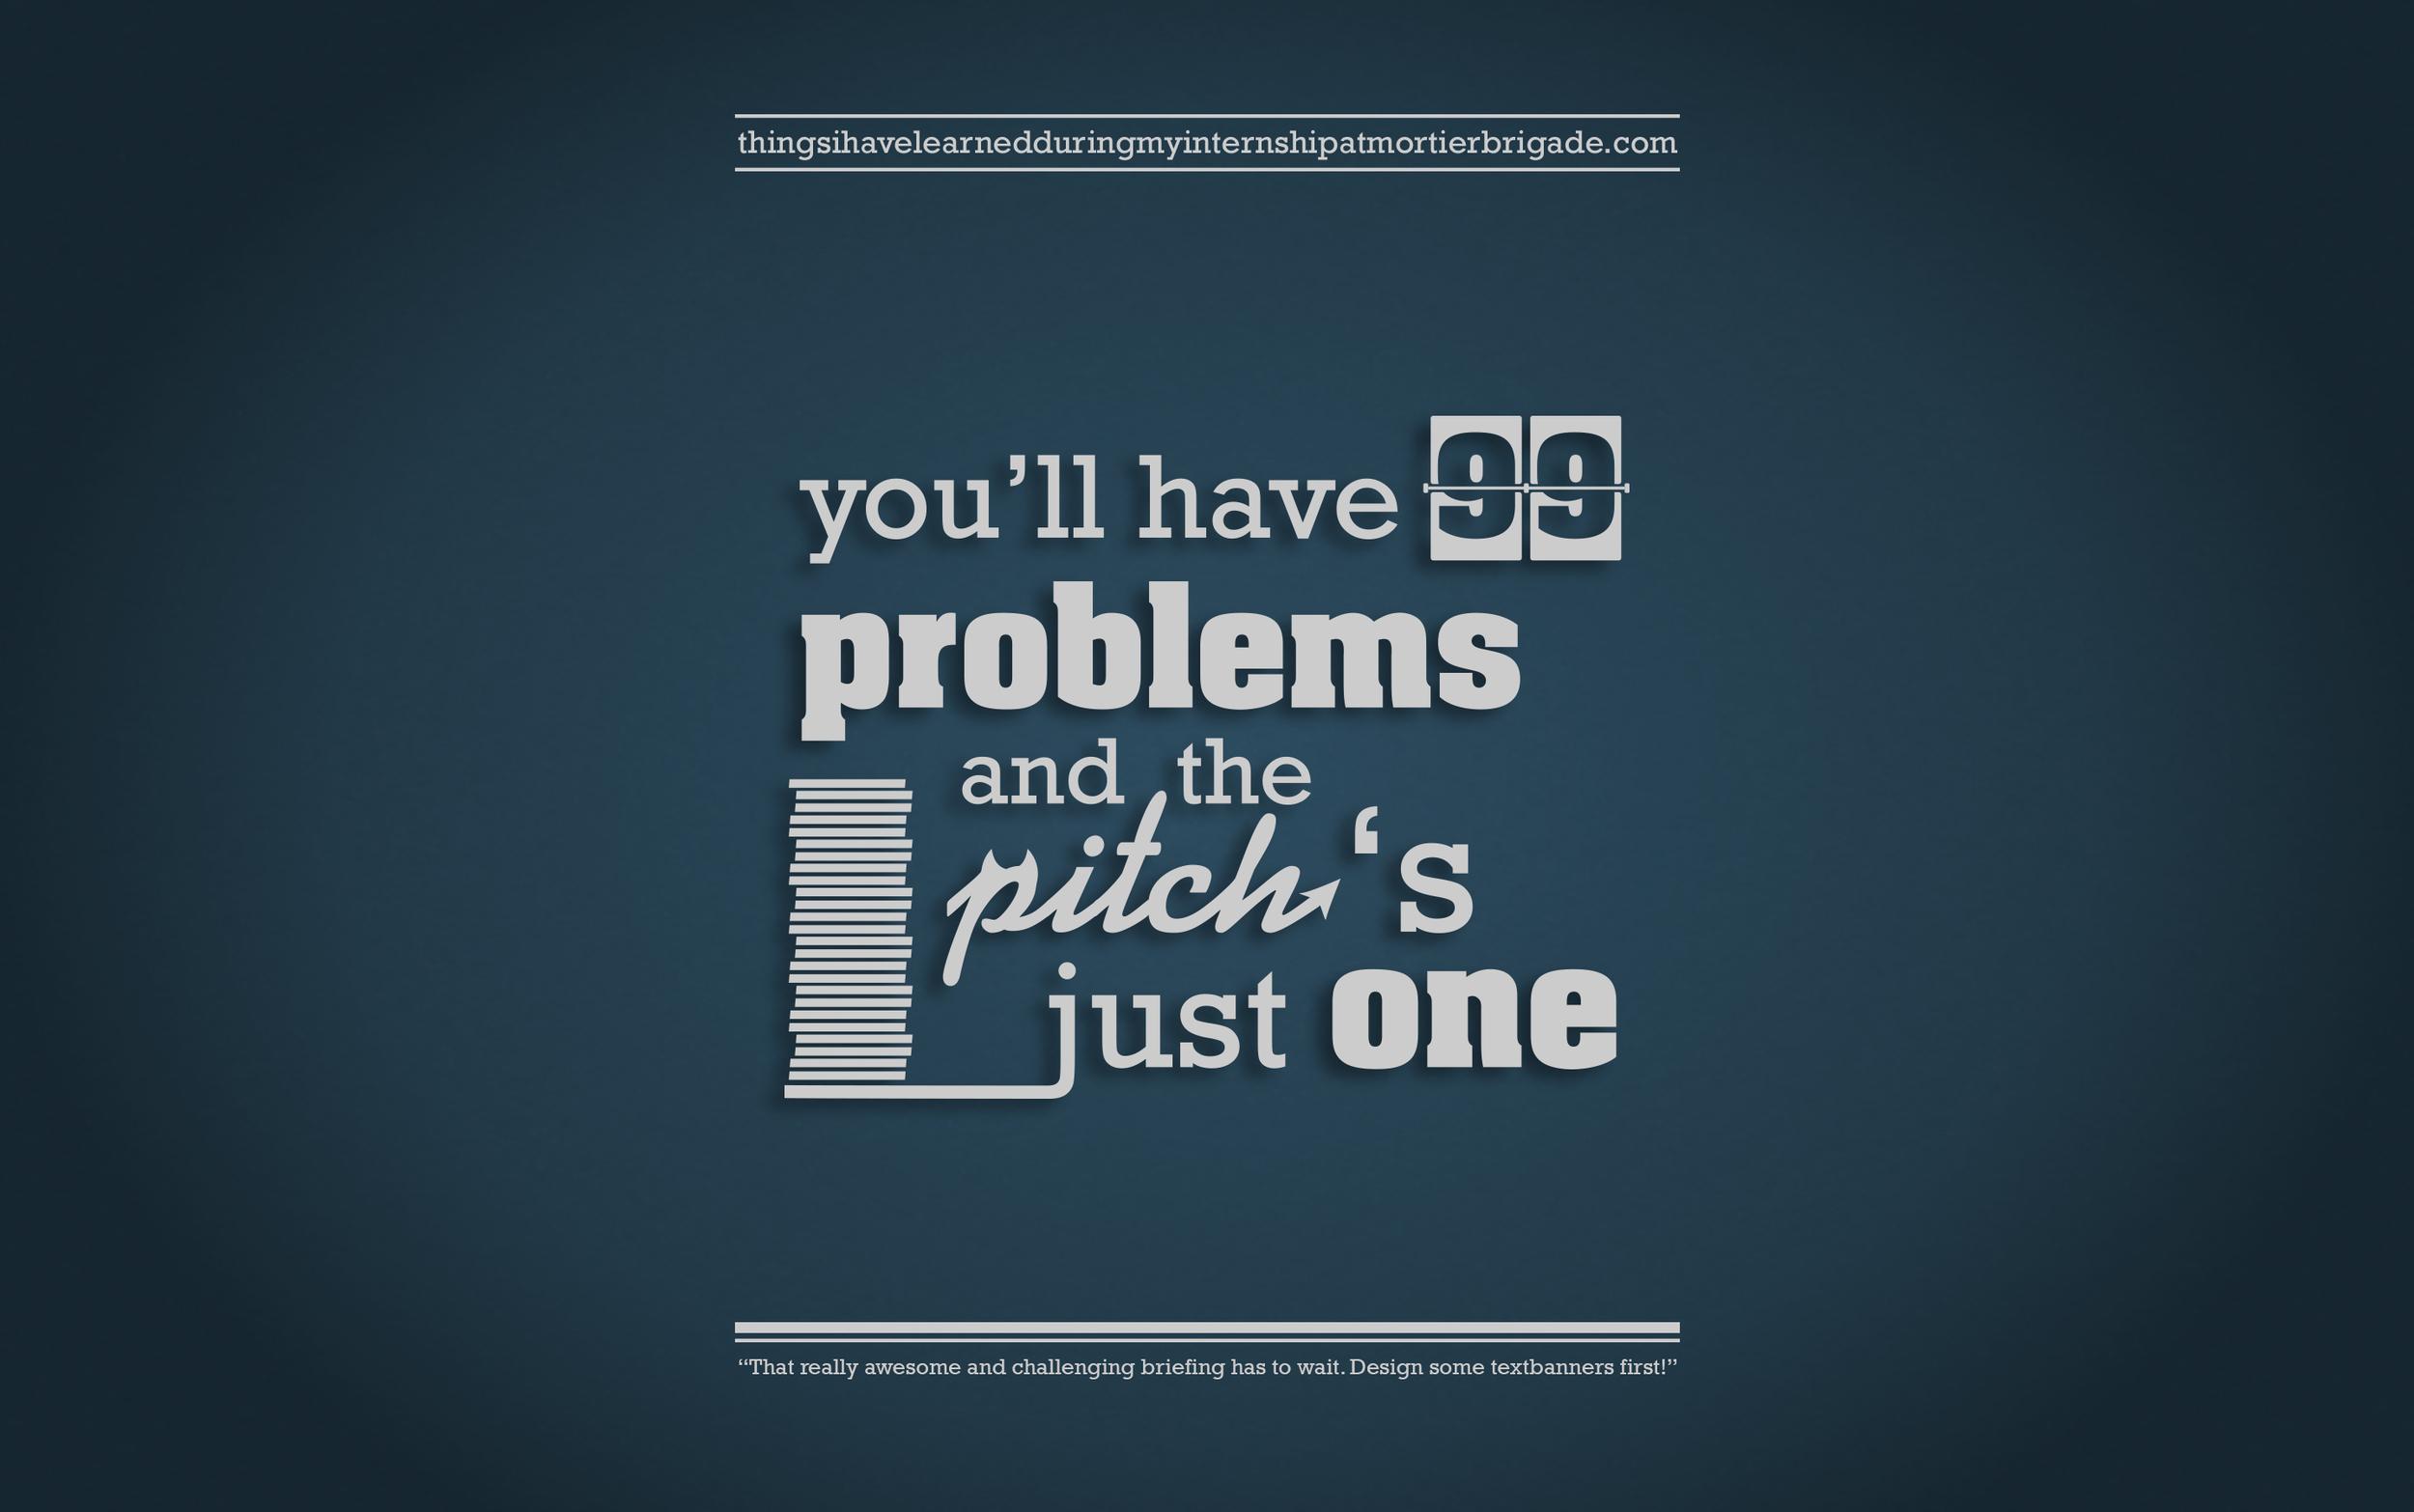 Brigadisms 12 99 problems.jpg